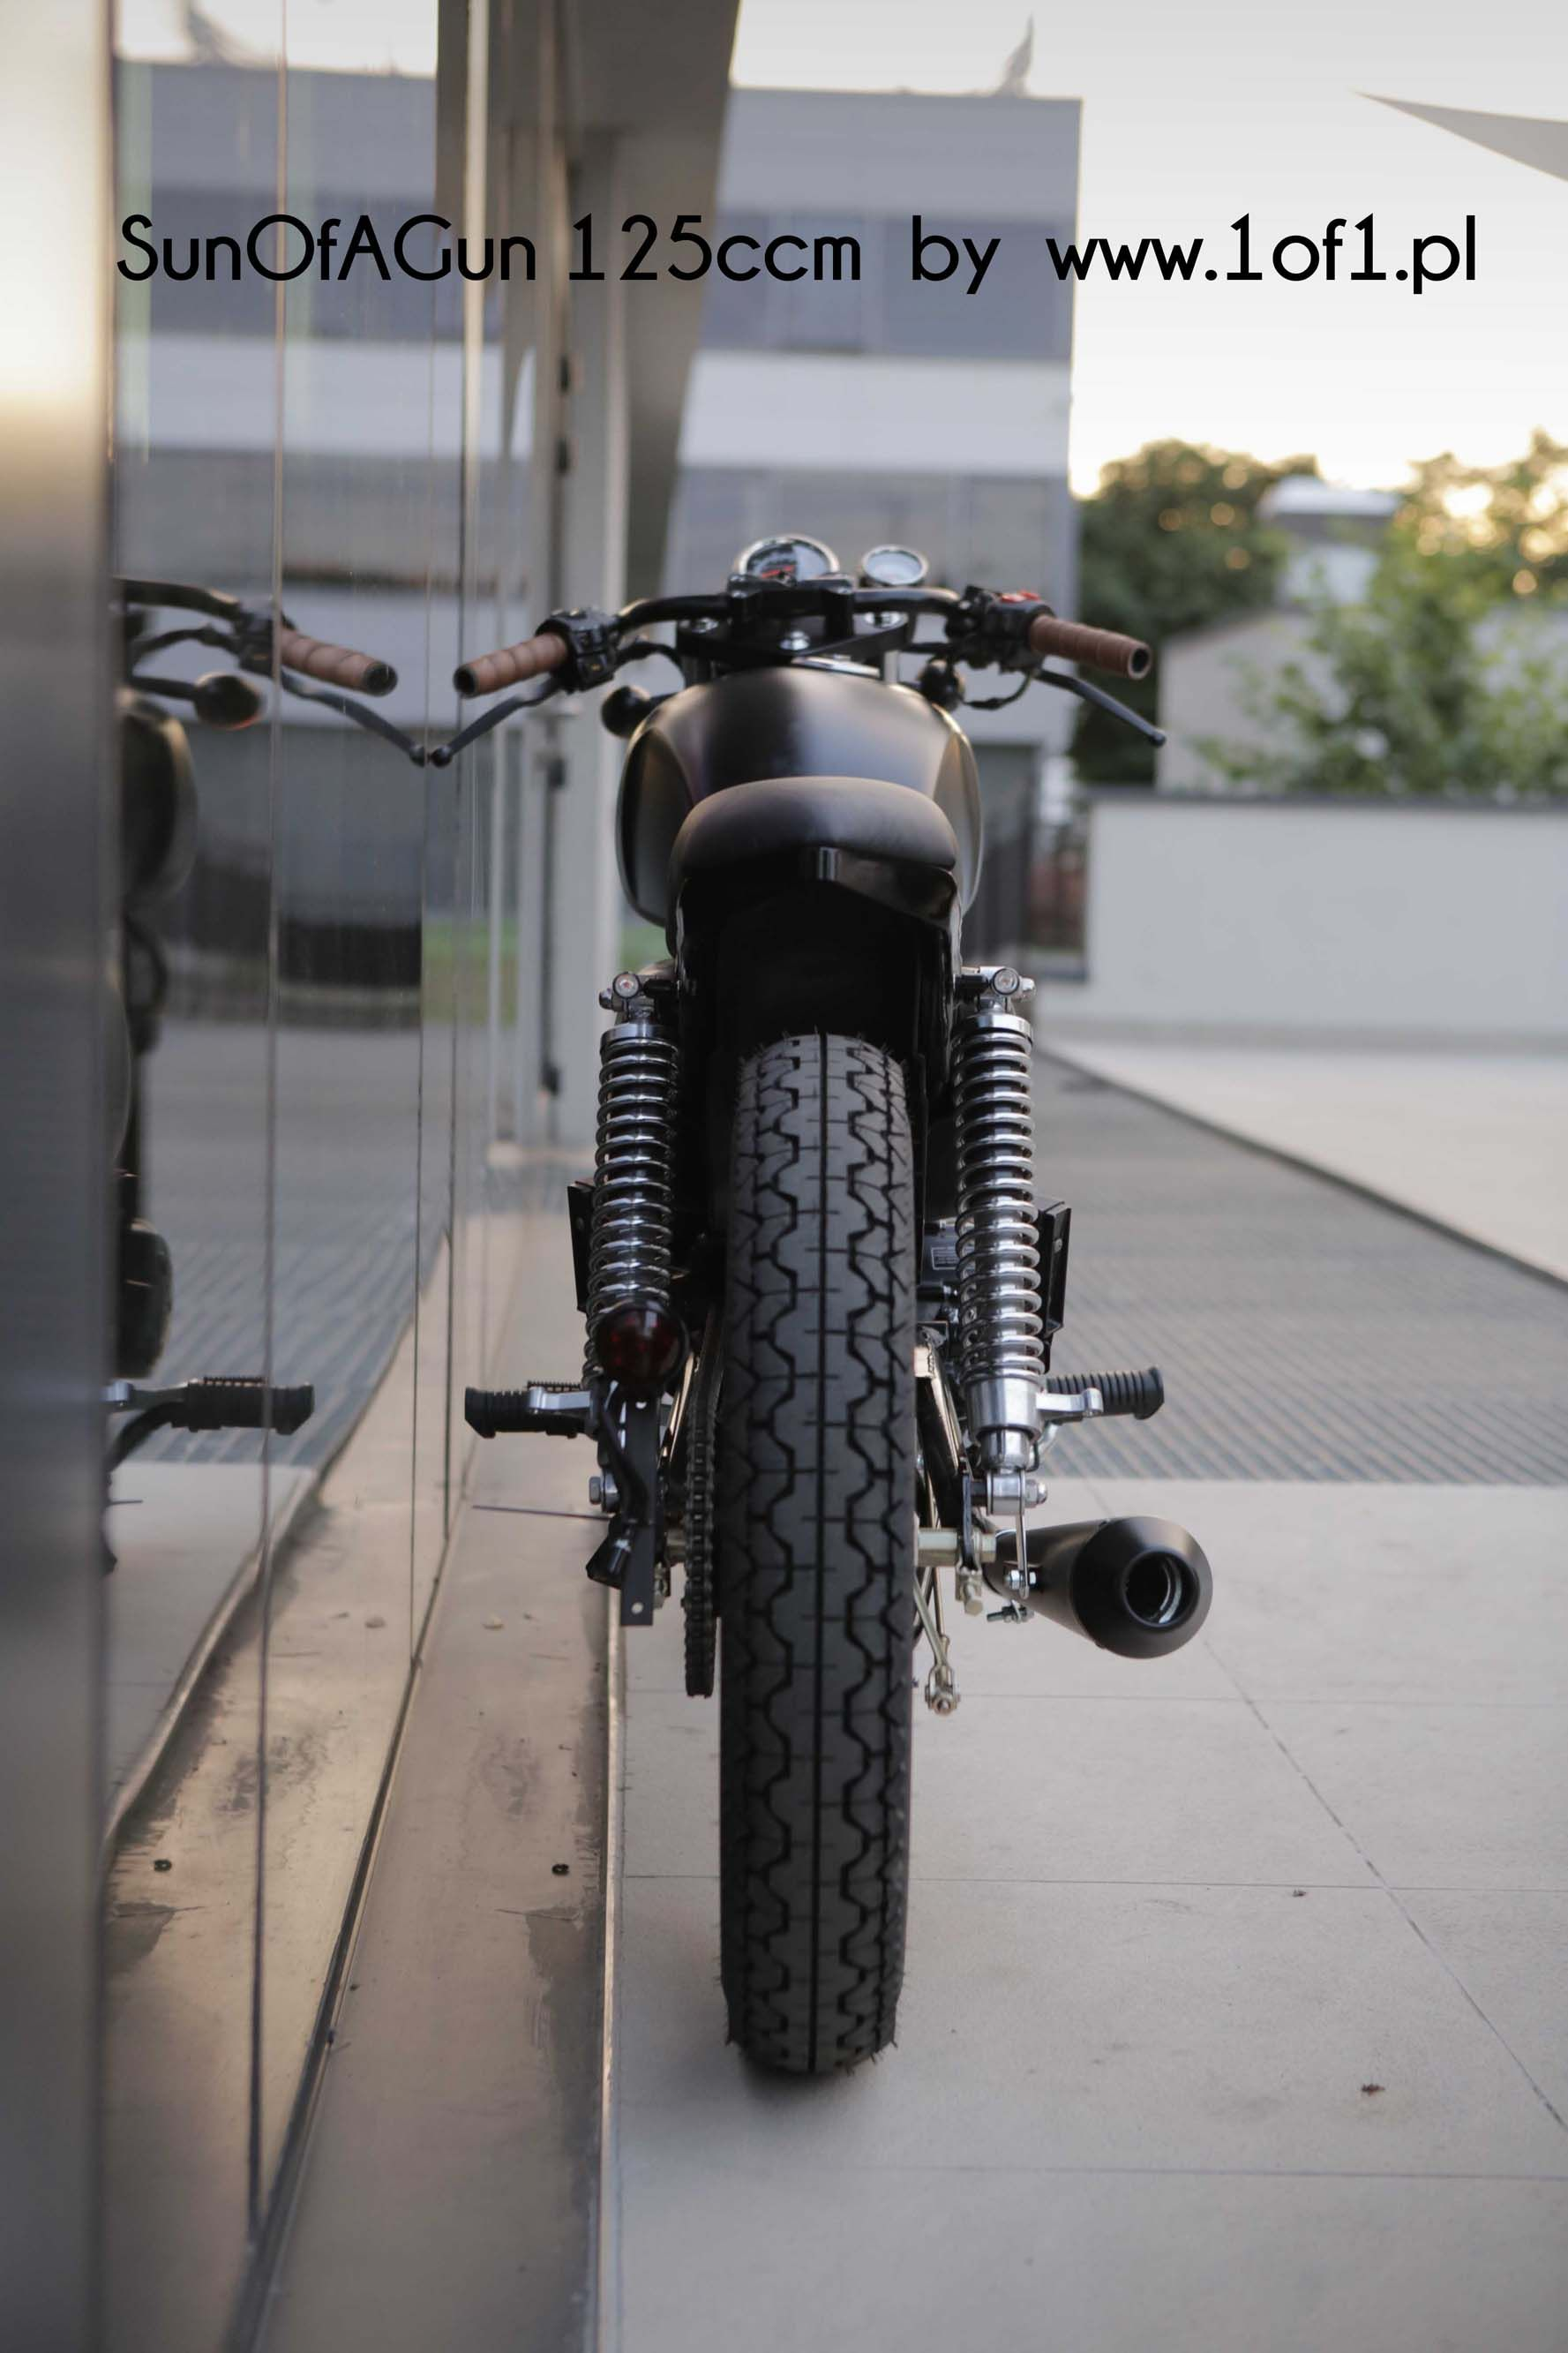 Ogar 125 Ccm Son Of A Gun By Unikat Motorworks Custom Garage All New Cbr 150r Slick Black White Jakarta